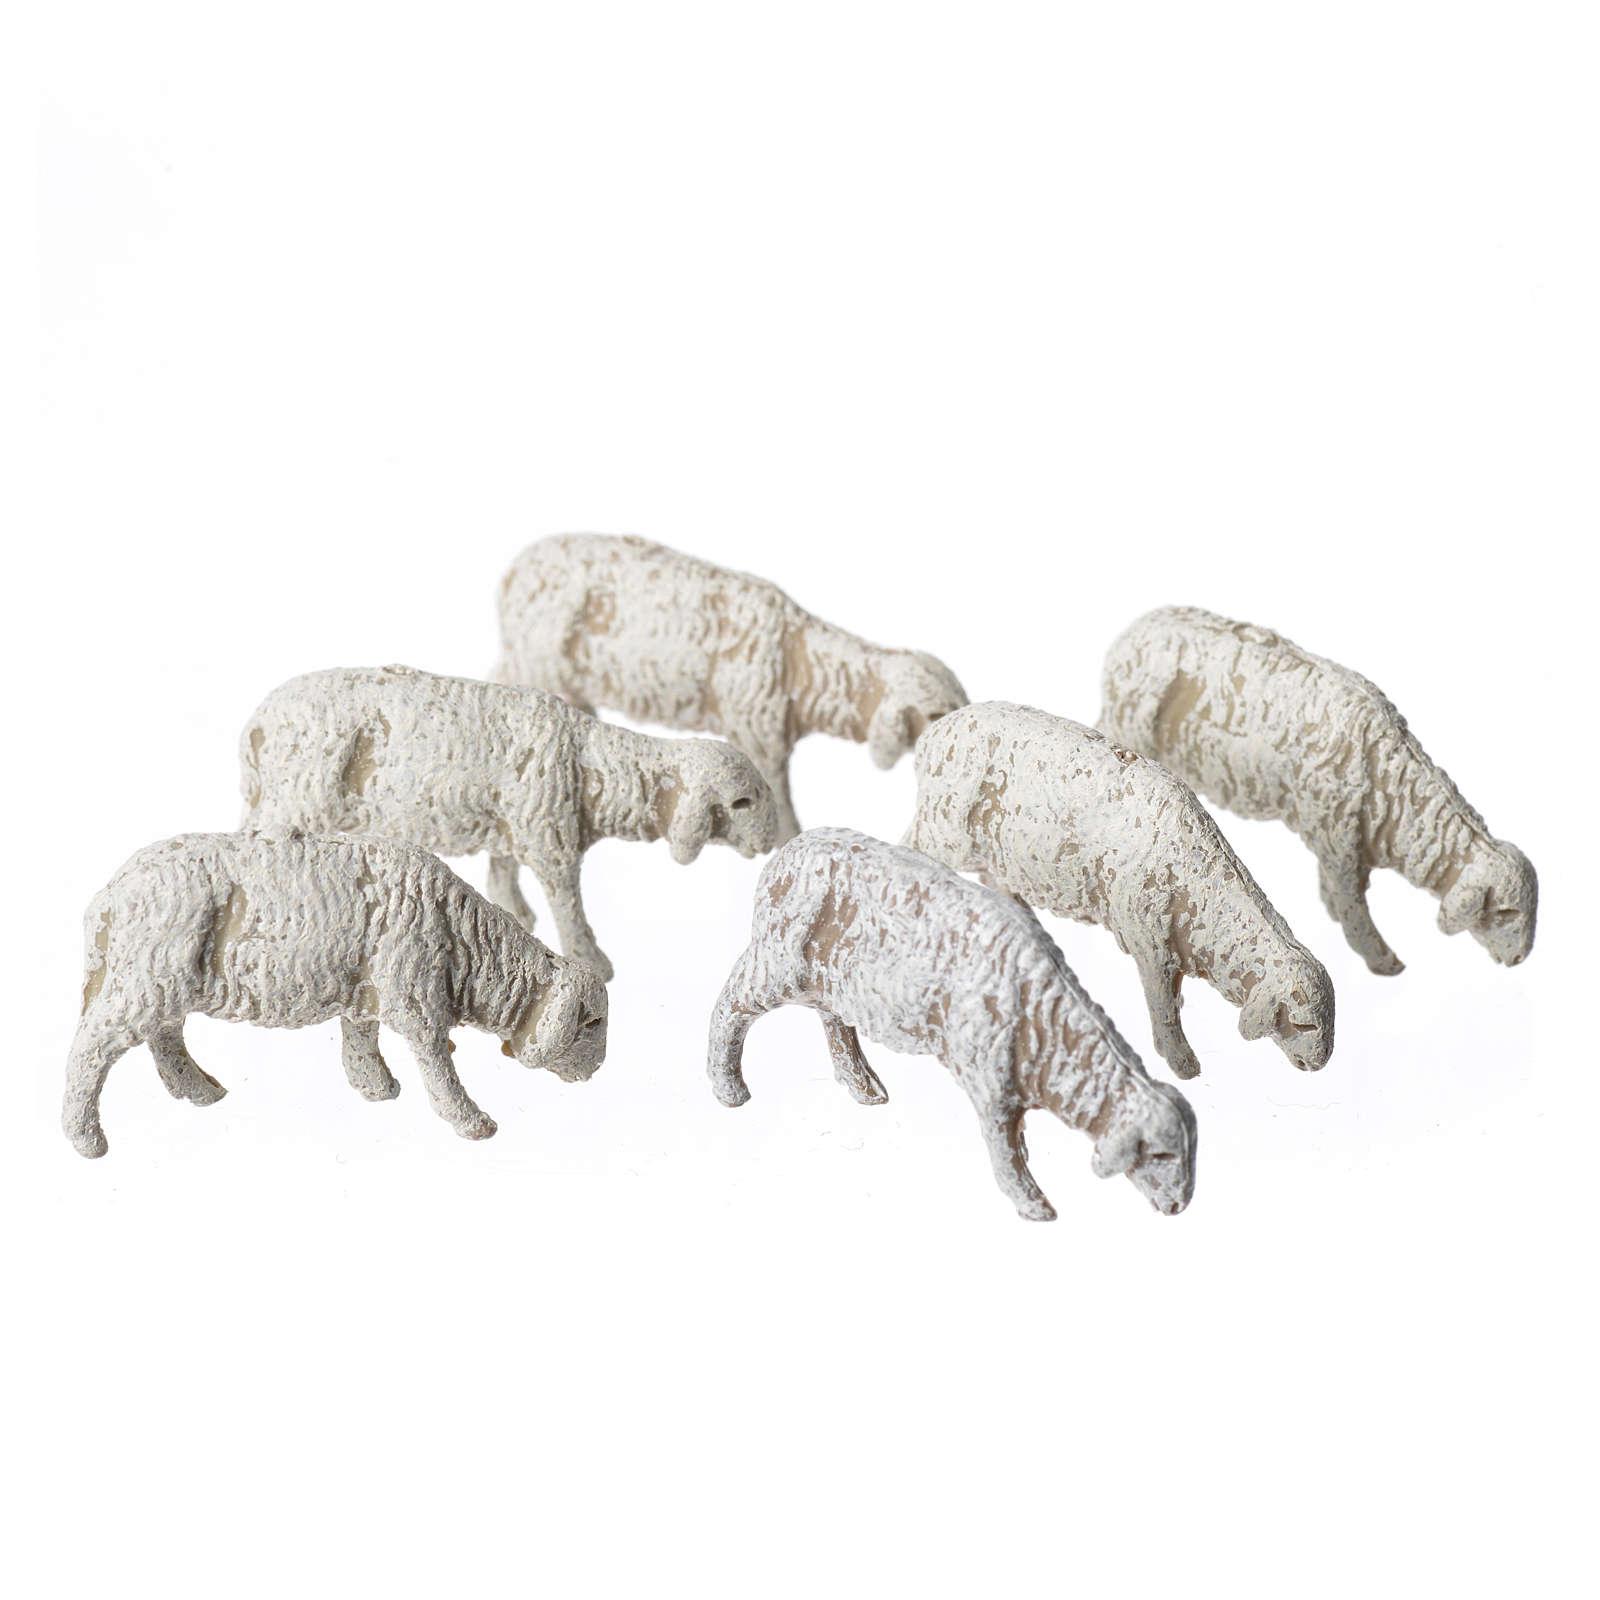 Owce 6 szt. Moranduzzo 6 cm 4